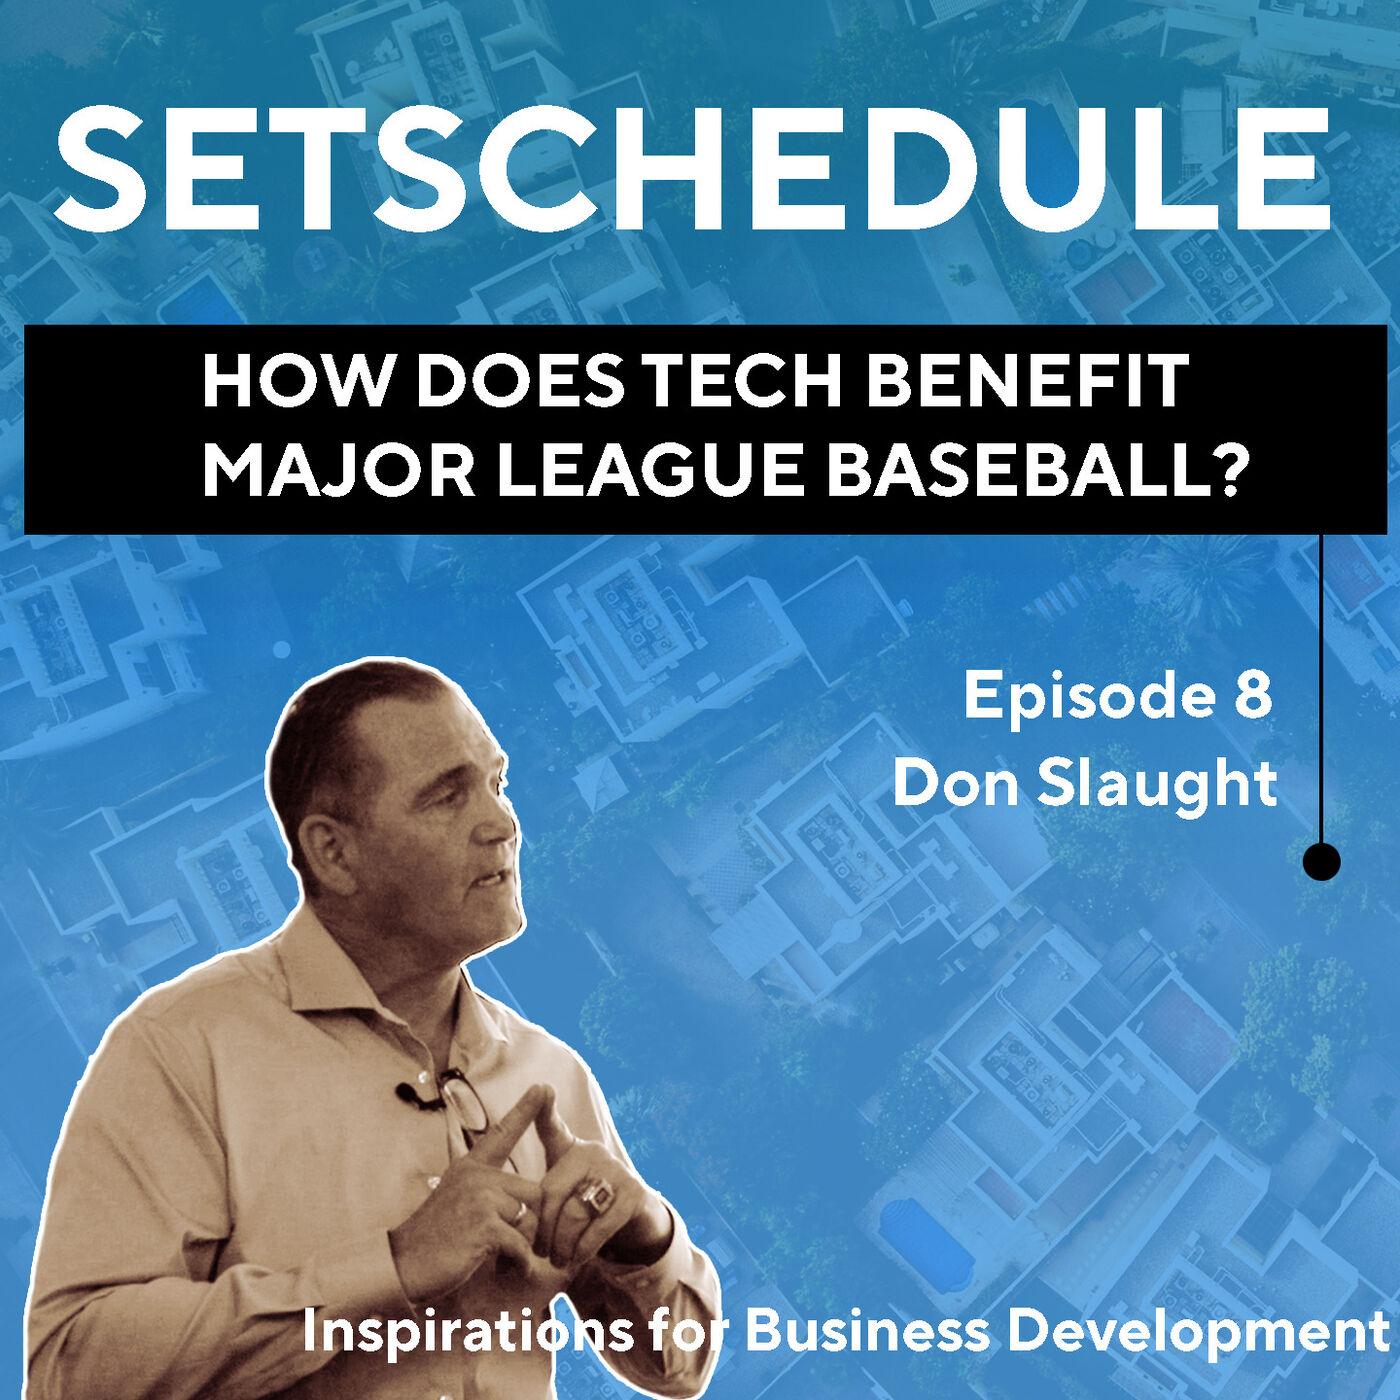 How Does Tech Benefit Major League Baseball? - Don Slaught